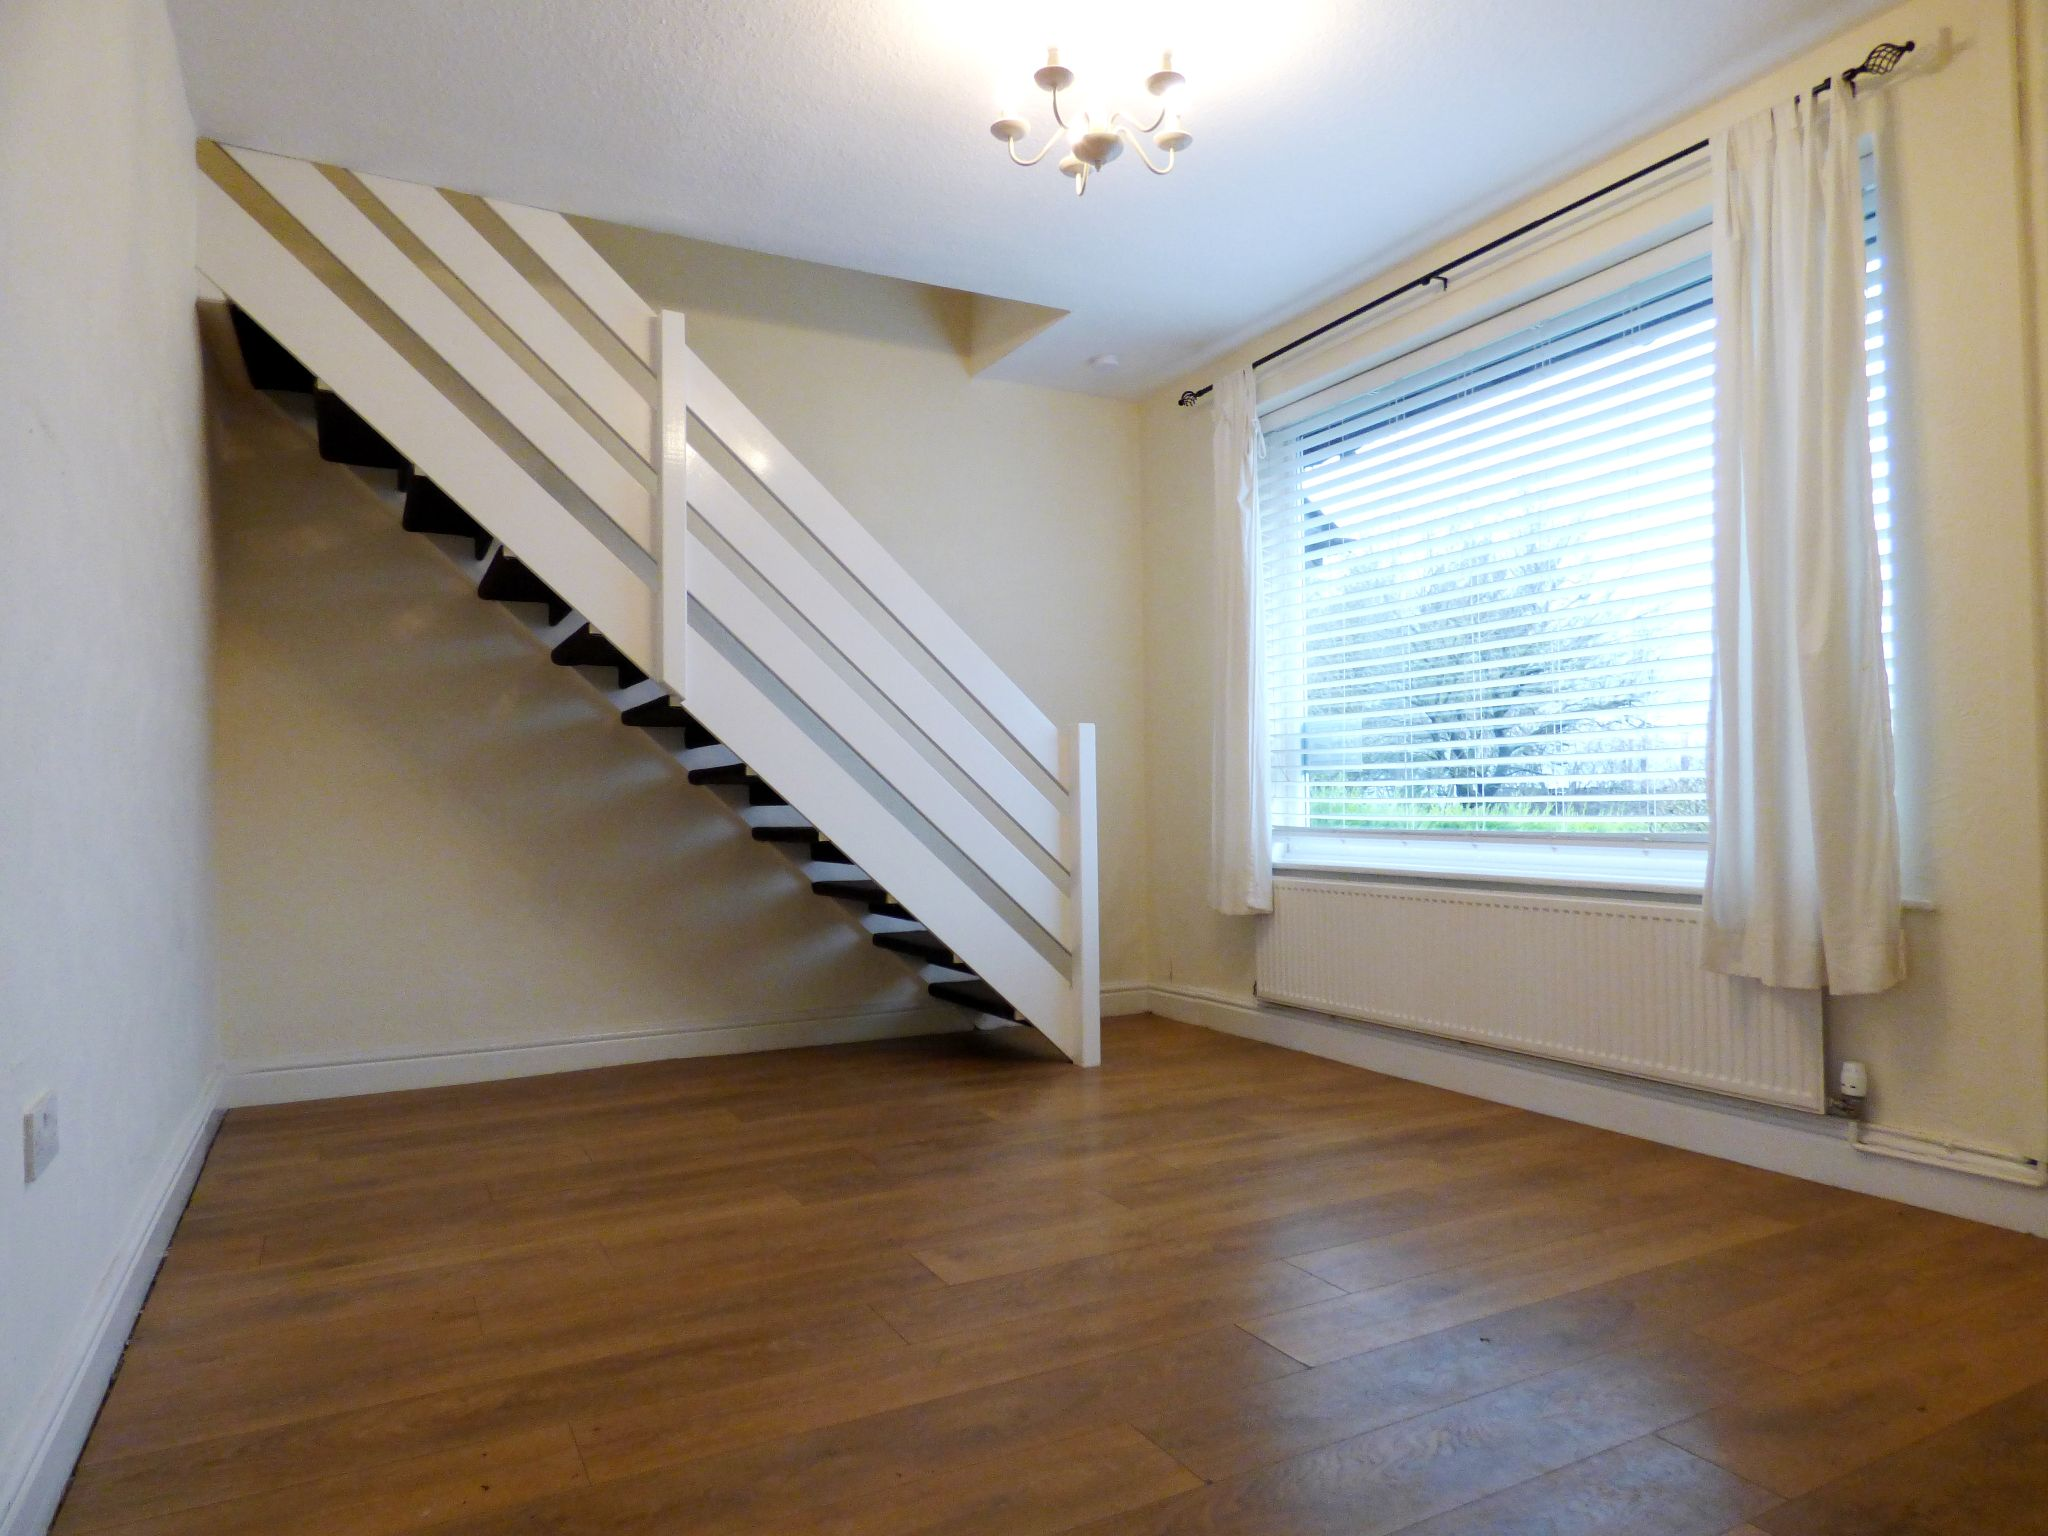 3 Bedroom Detached Bungalow For Sale - Reception Room